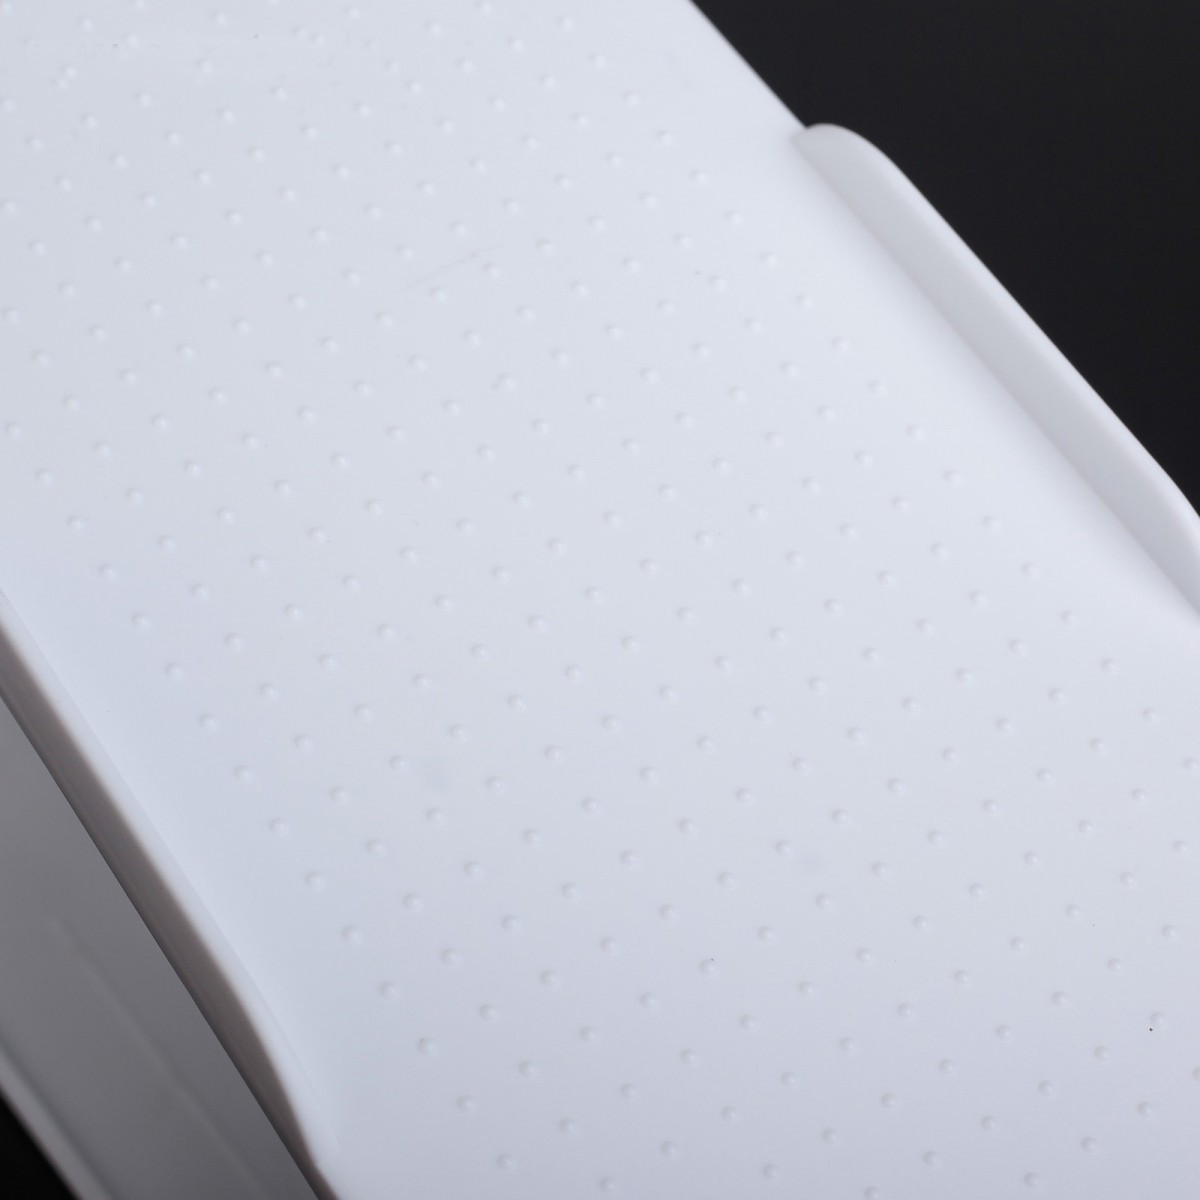 Комплект из подставок для обуви модель 1, белый, 5 шт, 25 х 9 х 10-18 см